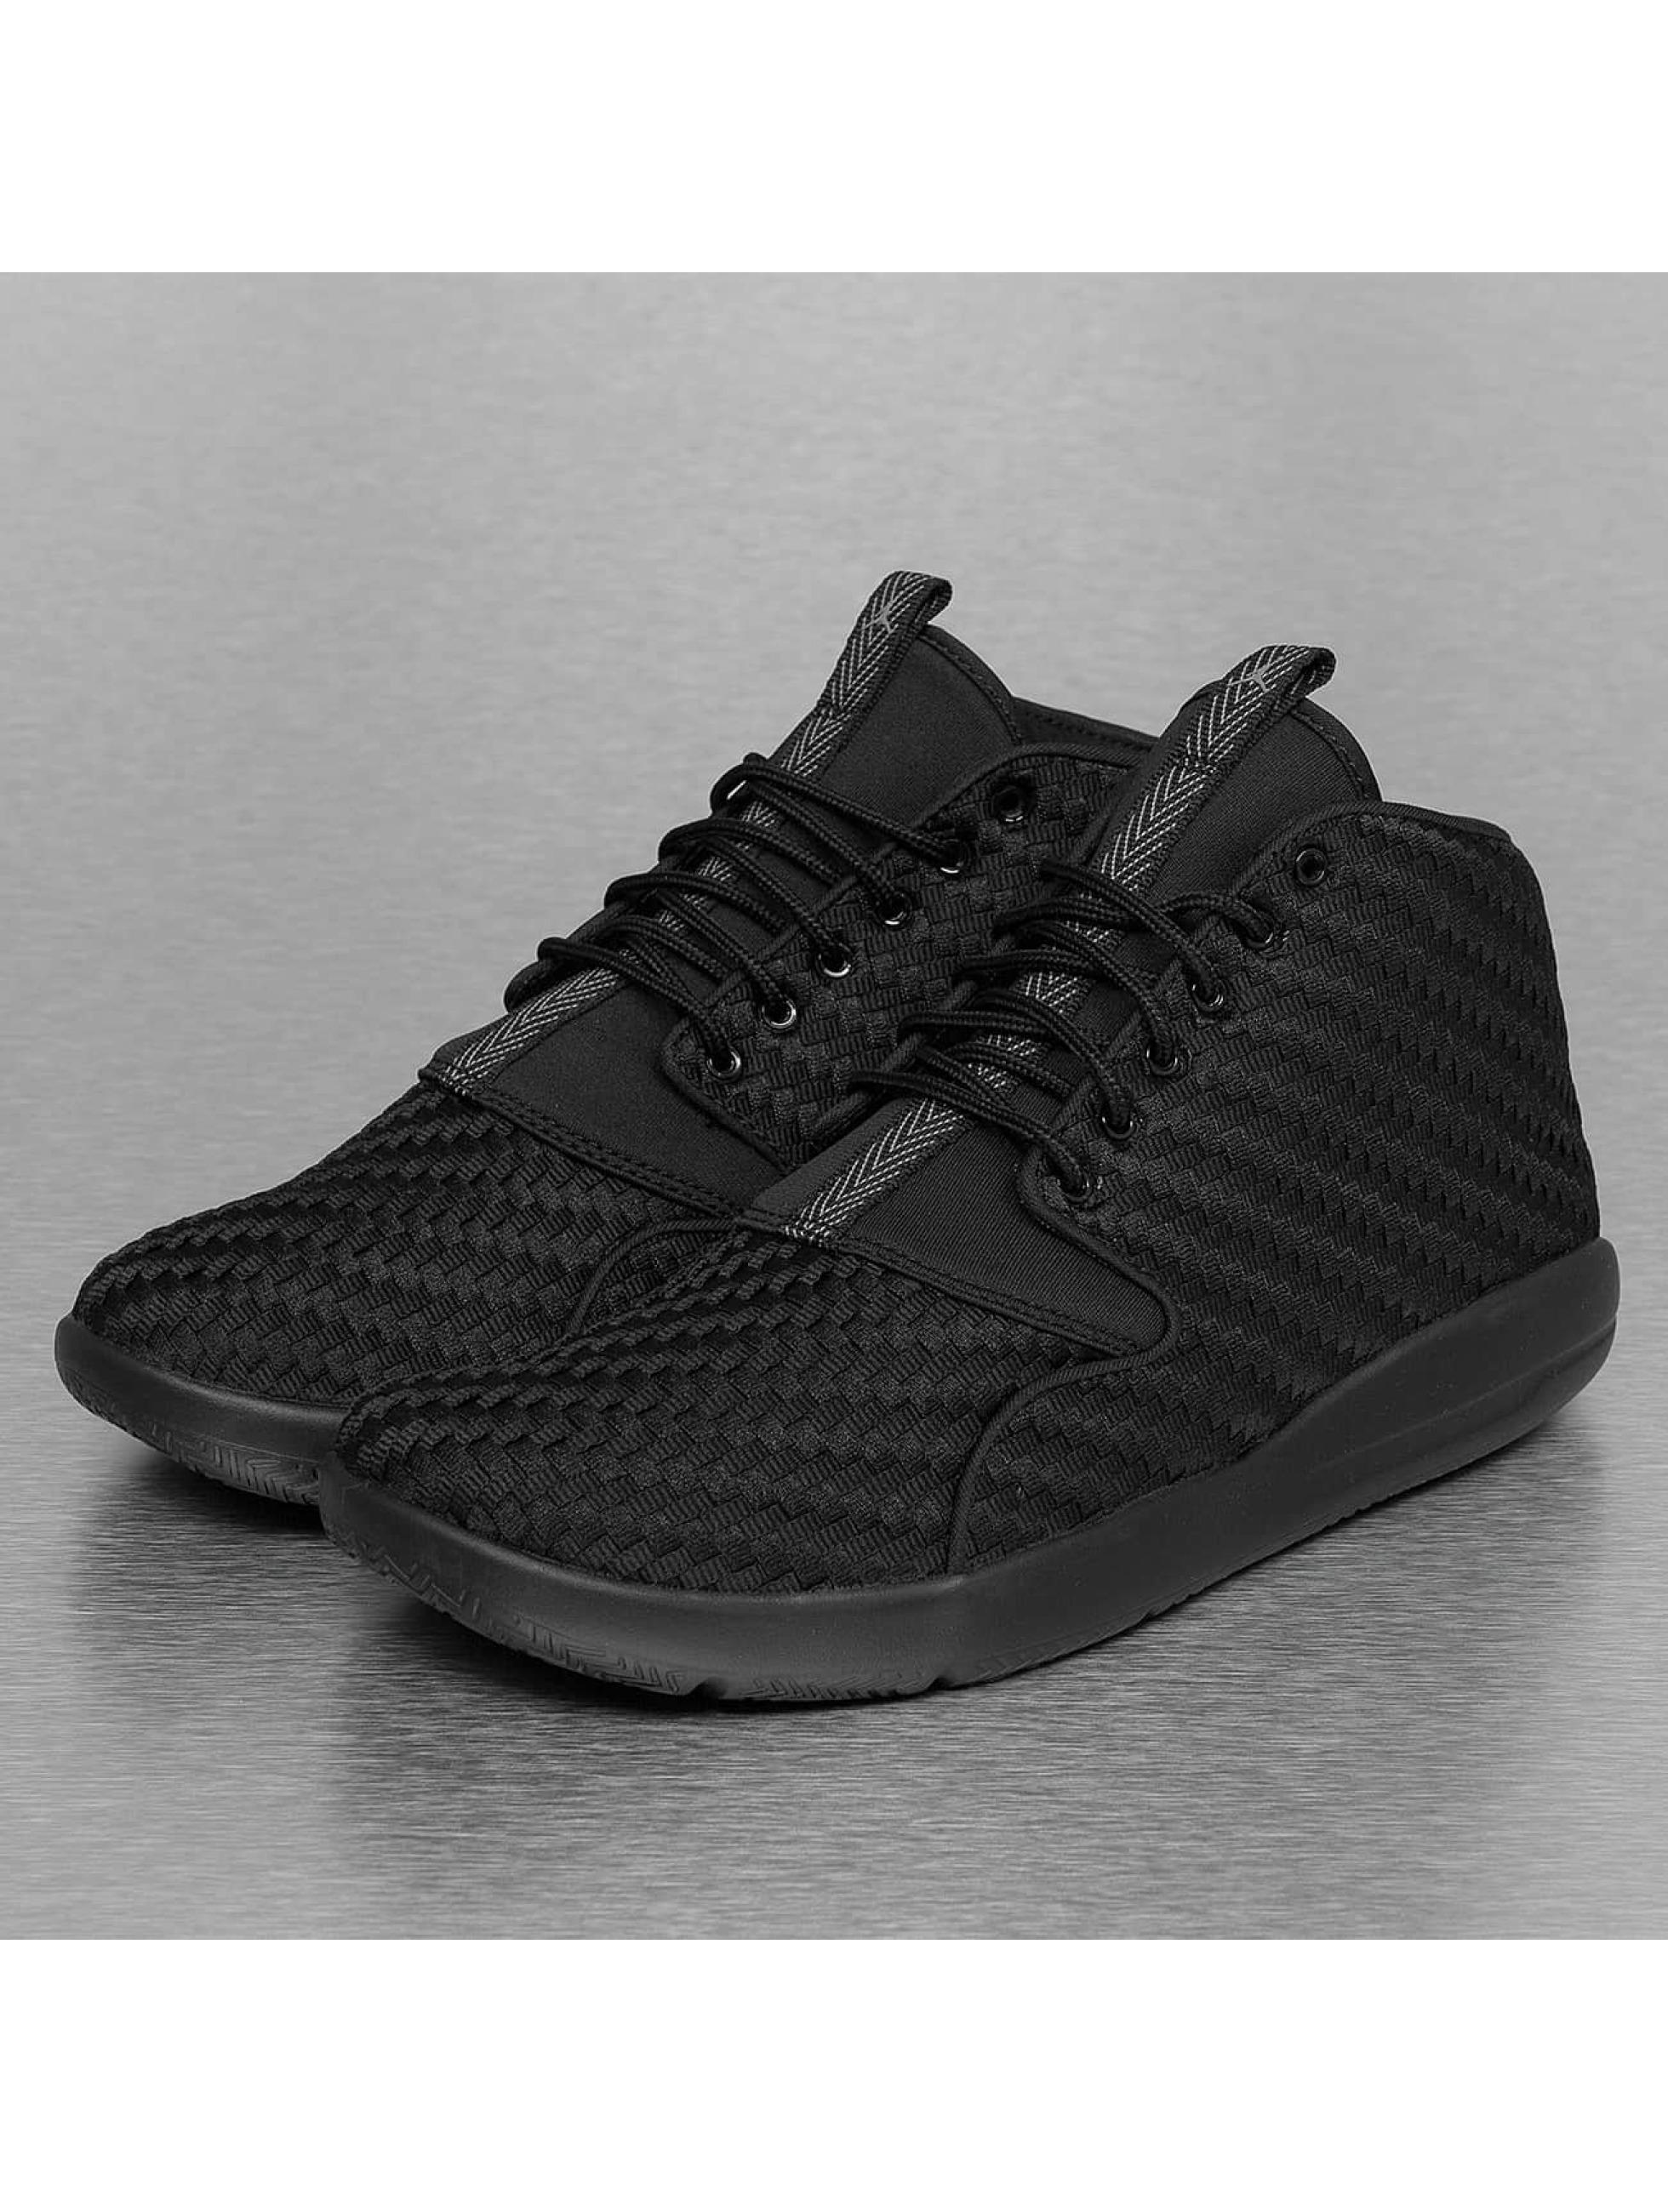 Jordan Männer Sneaker Eclipse Chukka in schwarz